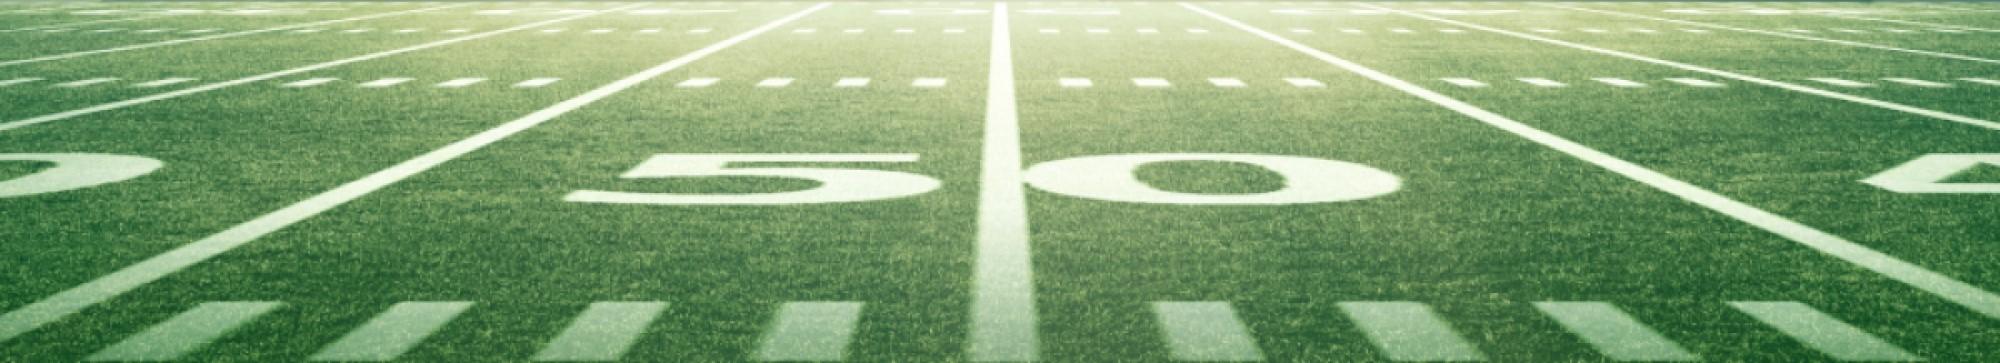 50 yard line image